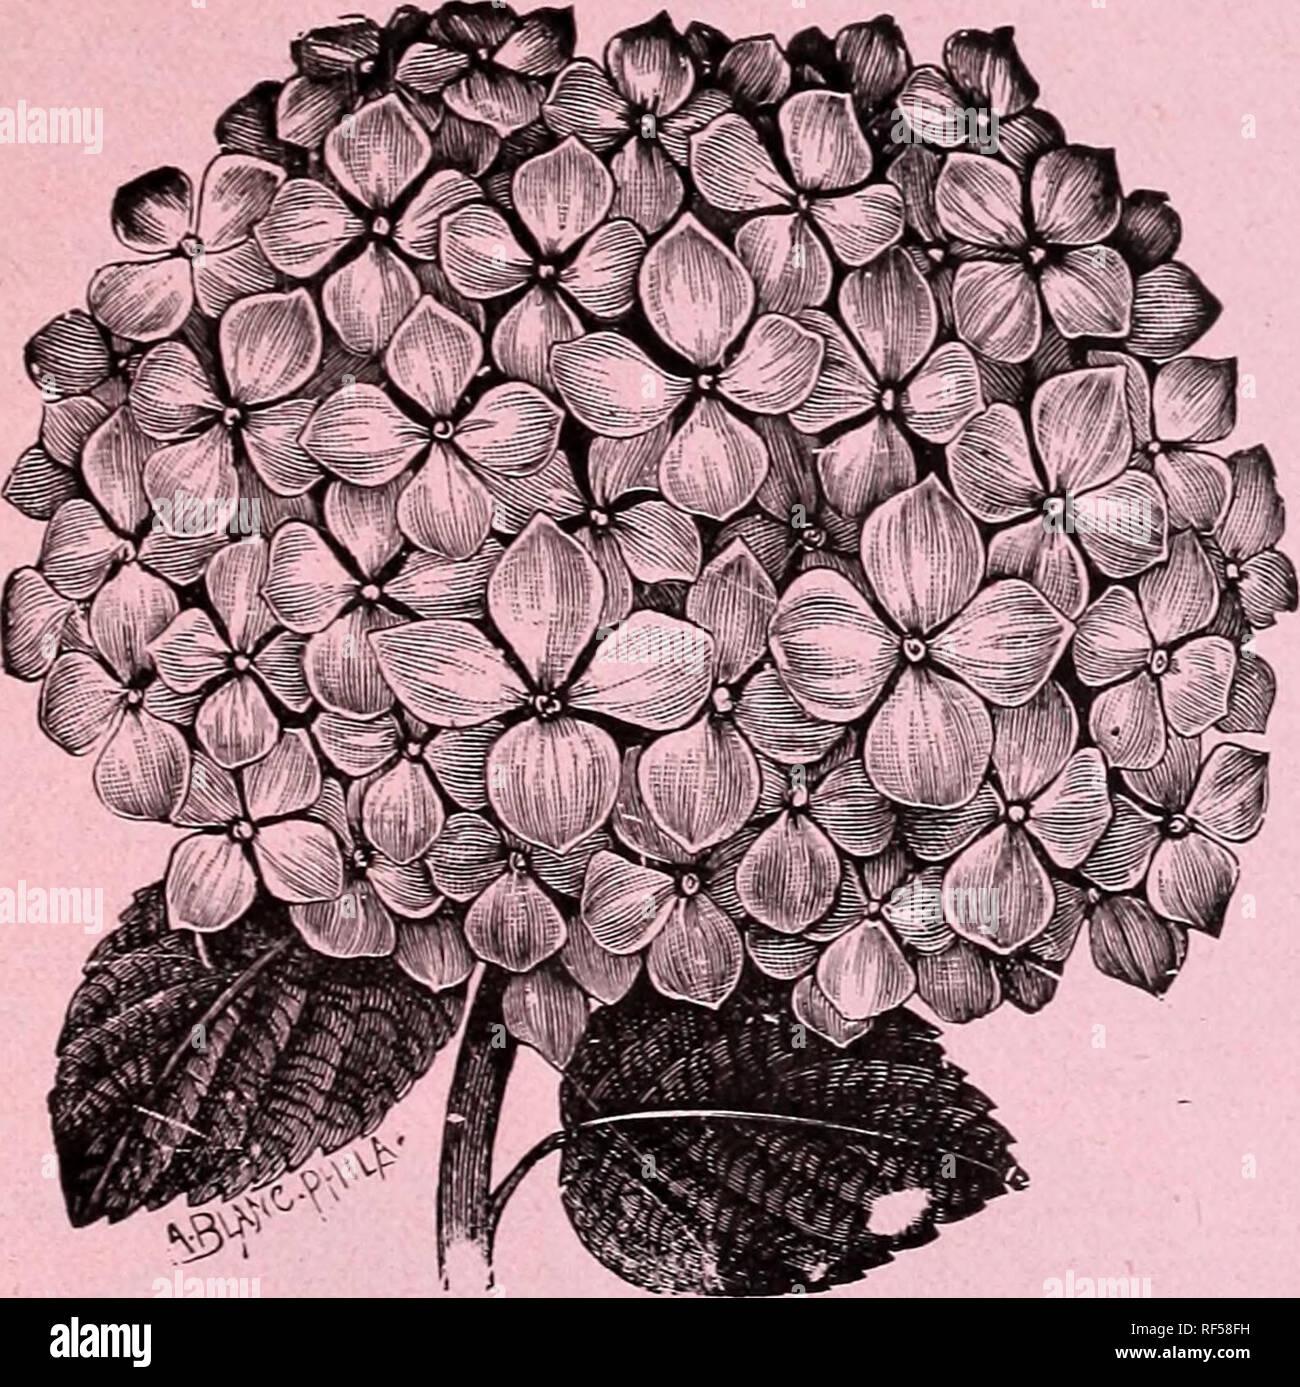 Florists' wholesale price list plants, bulbs, seeds, etc  : from